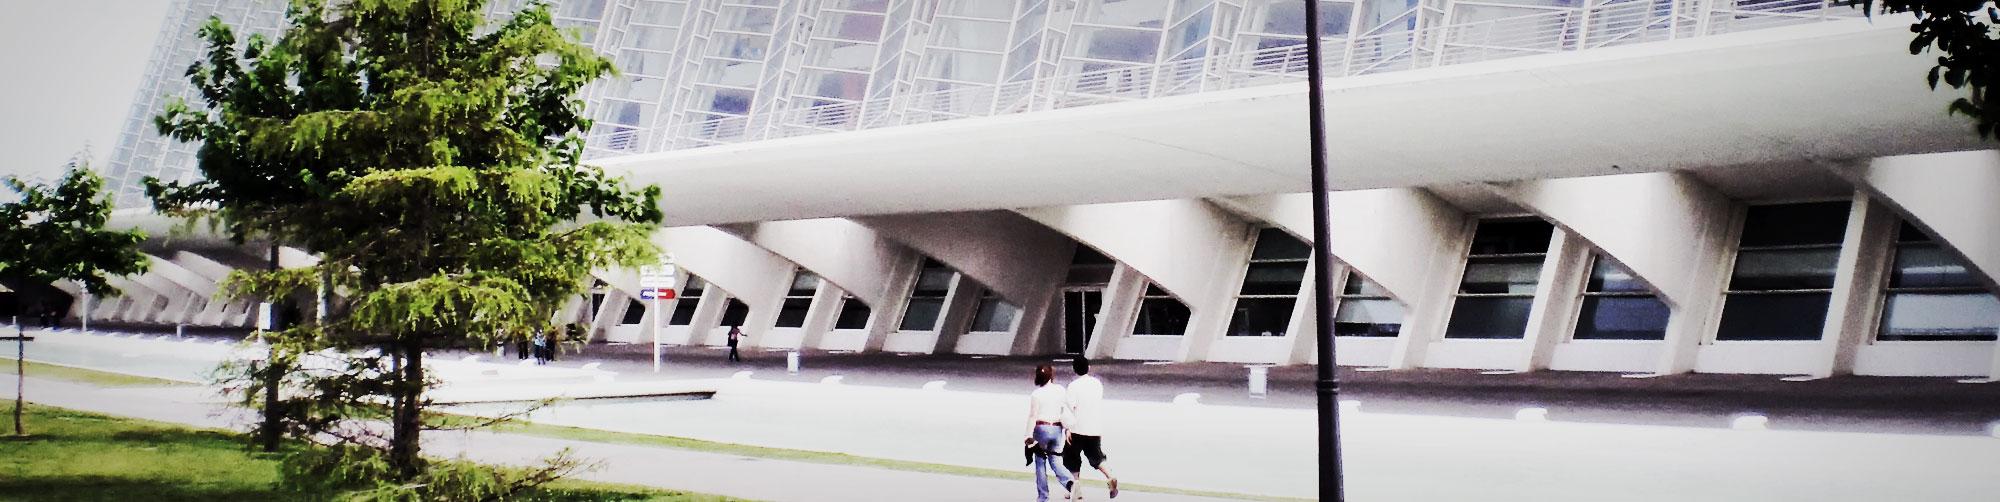 Euroace Valencia